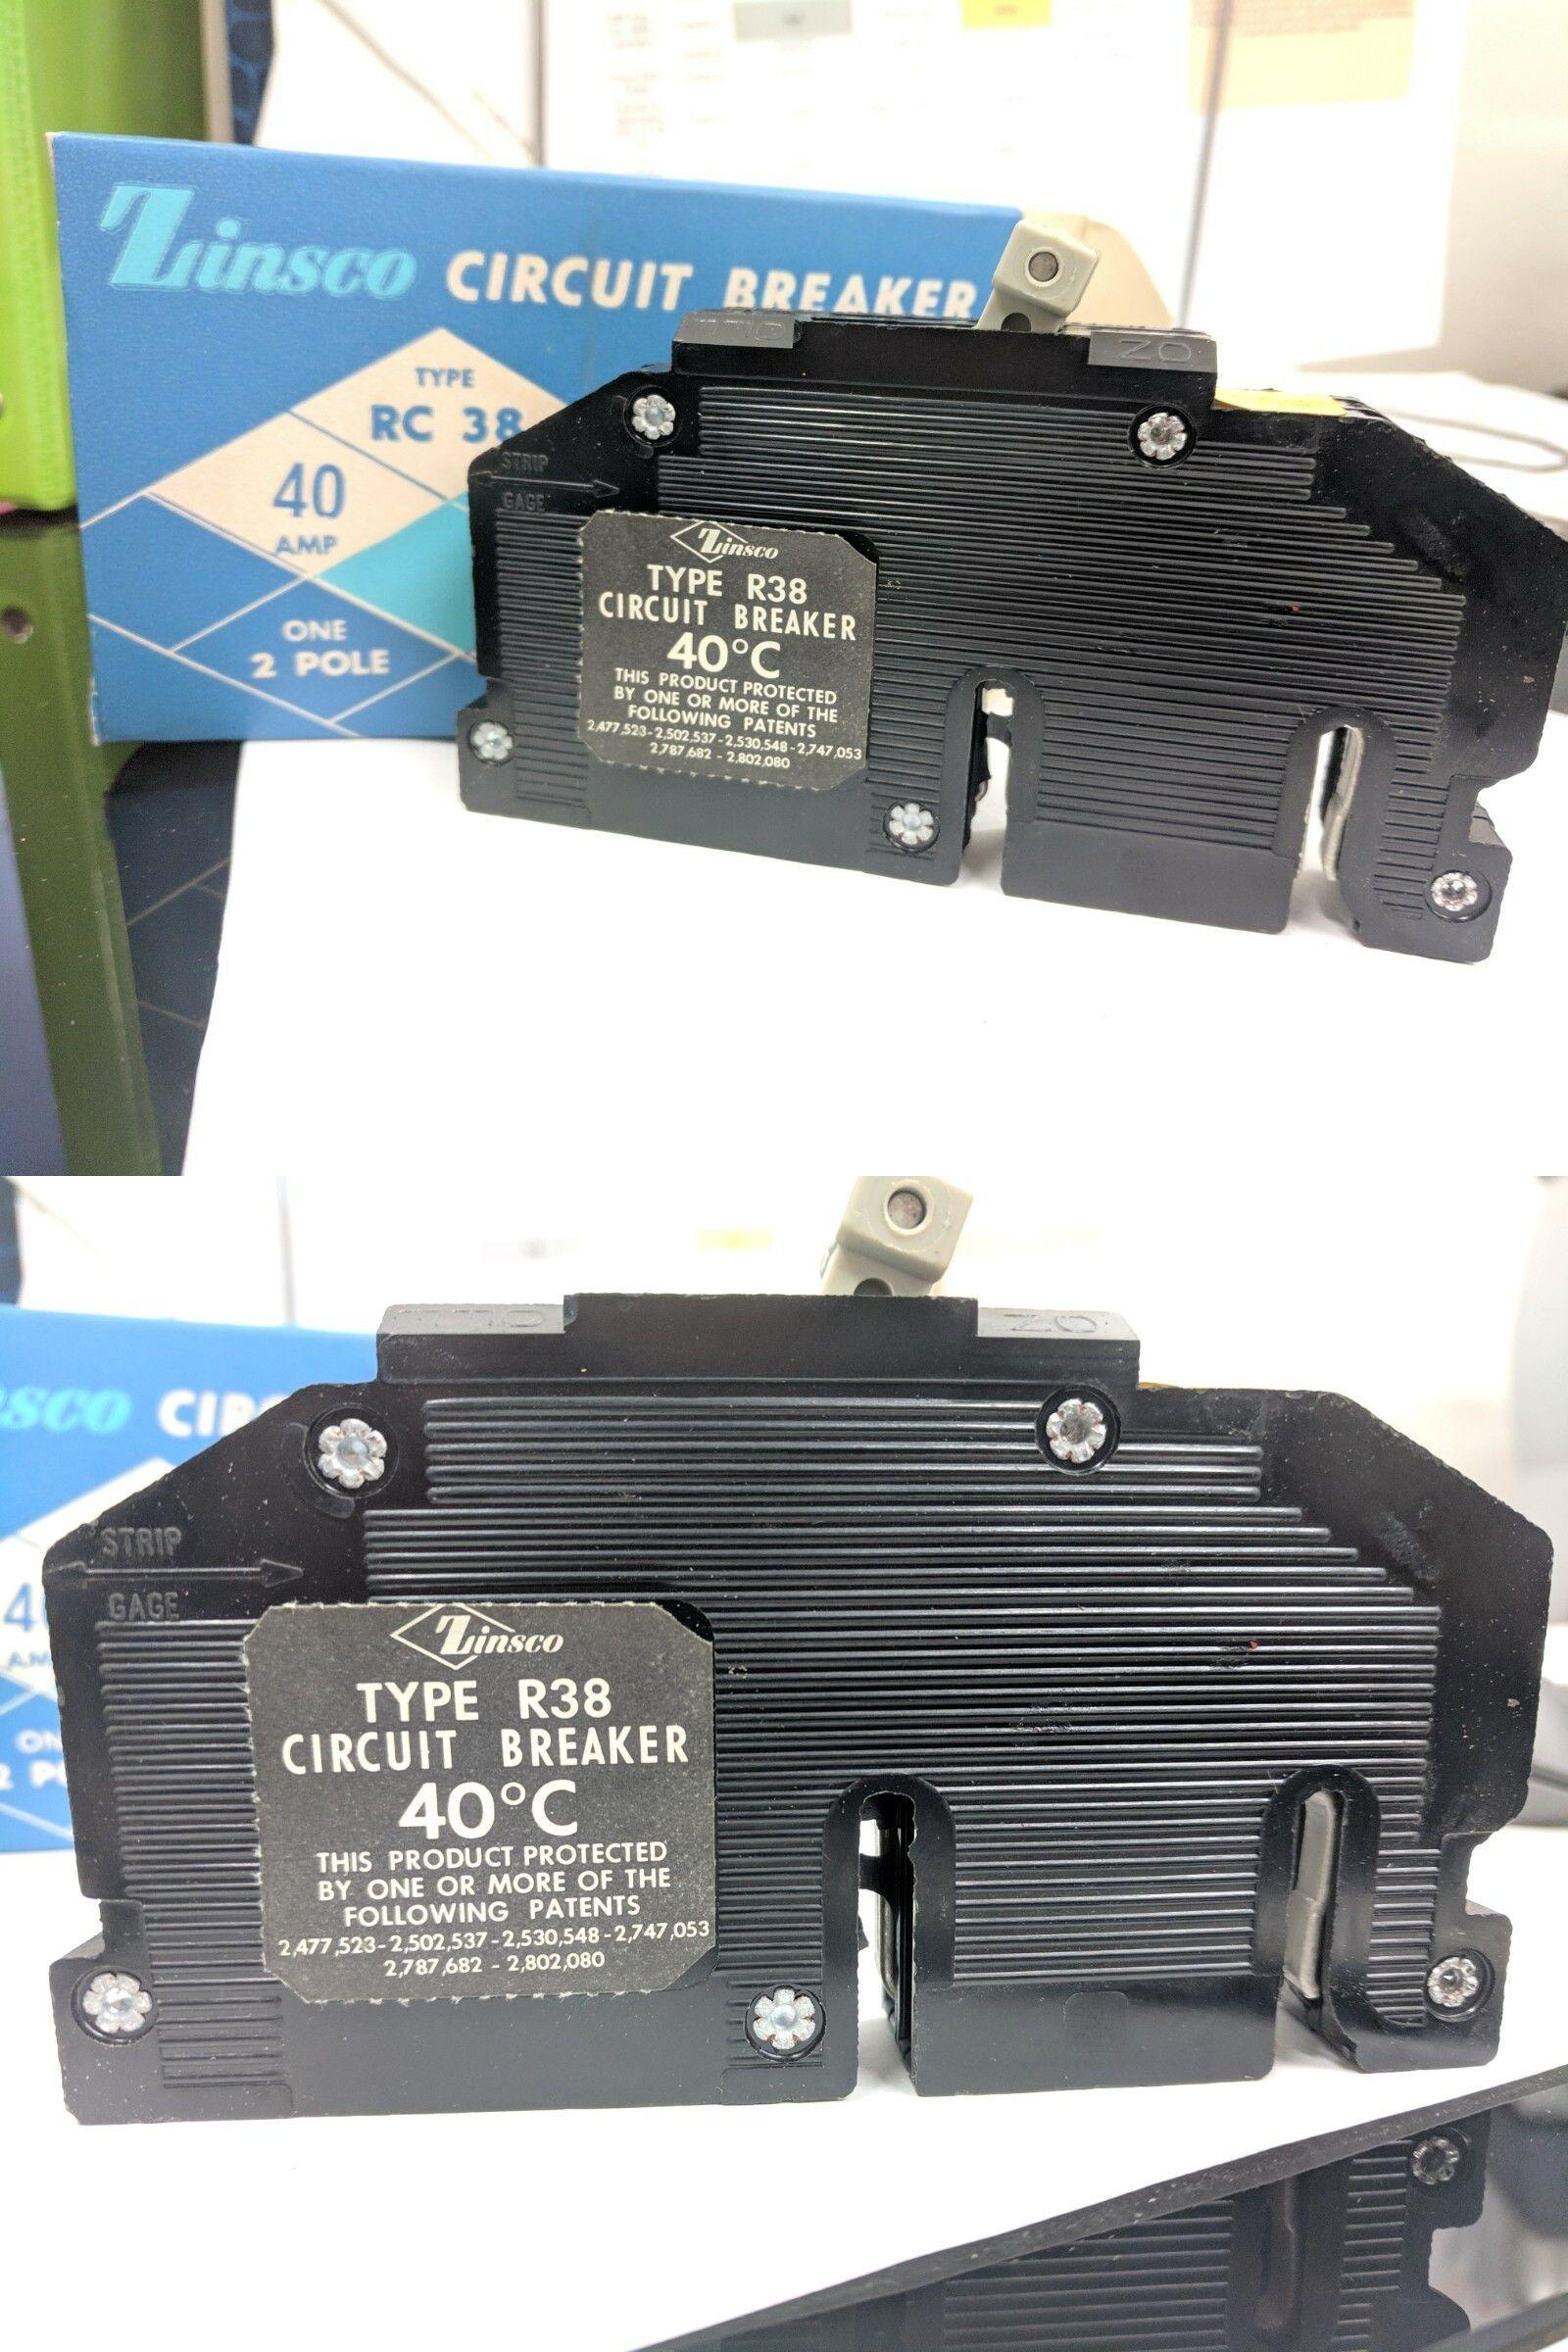 circuit breakers and fuse boxes 20596 zinsco circuit breaker 40 amp  zinsco fuse box #12